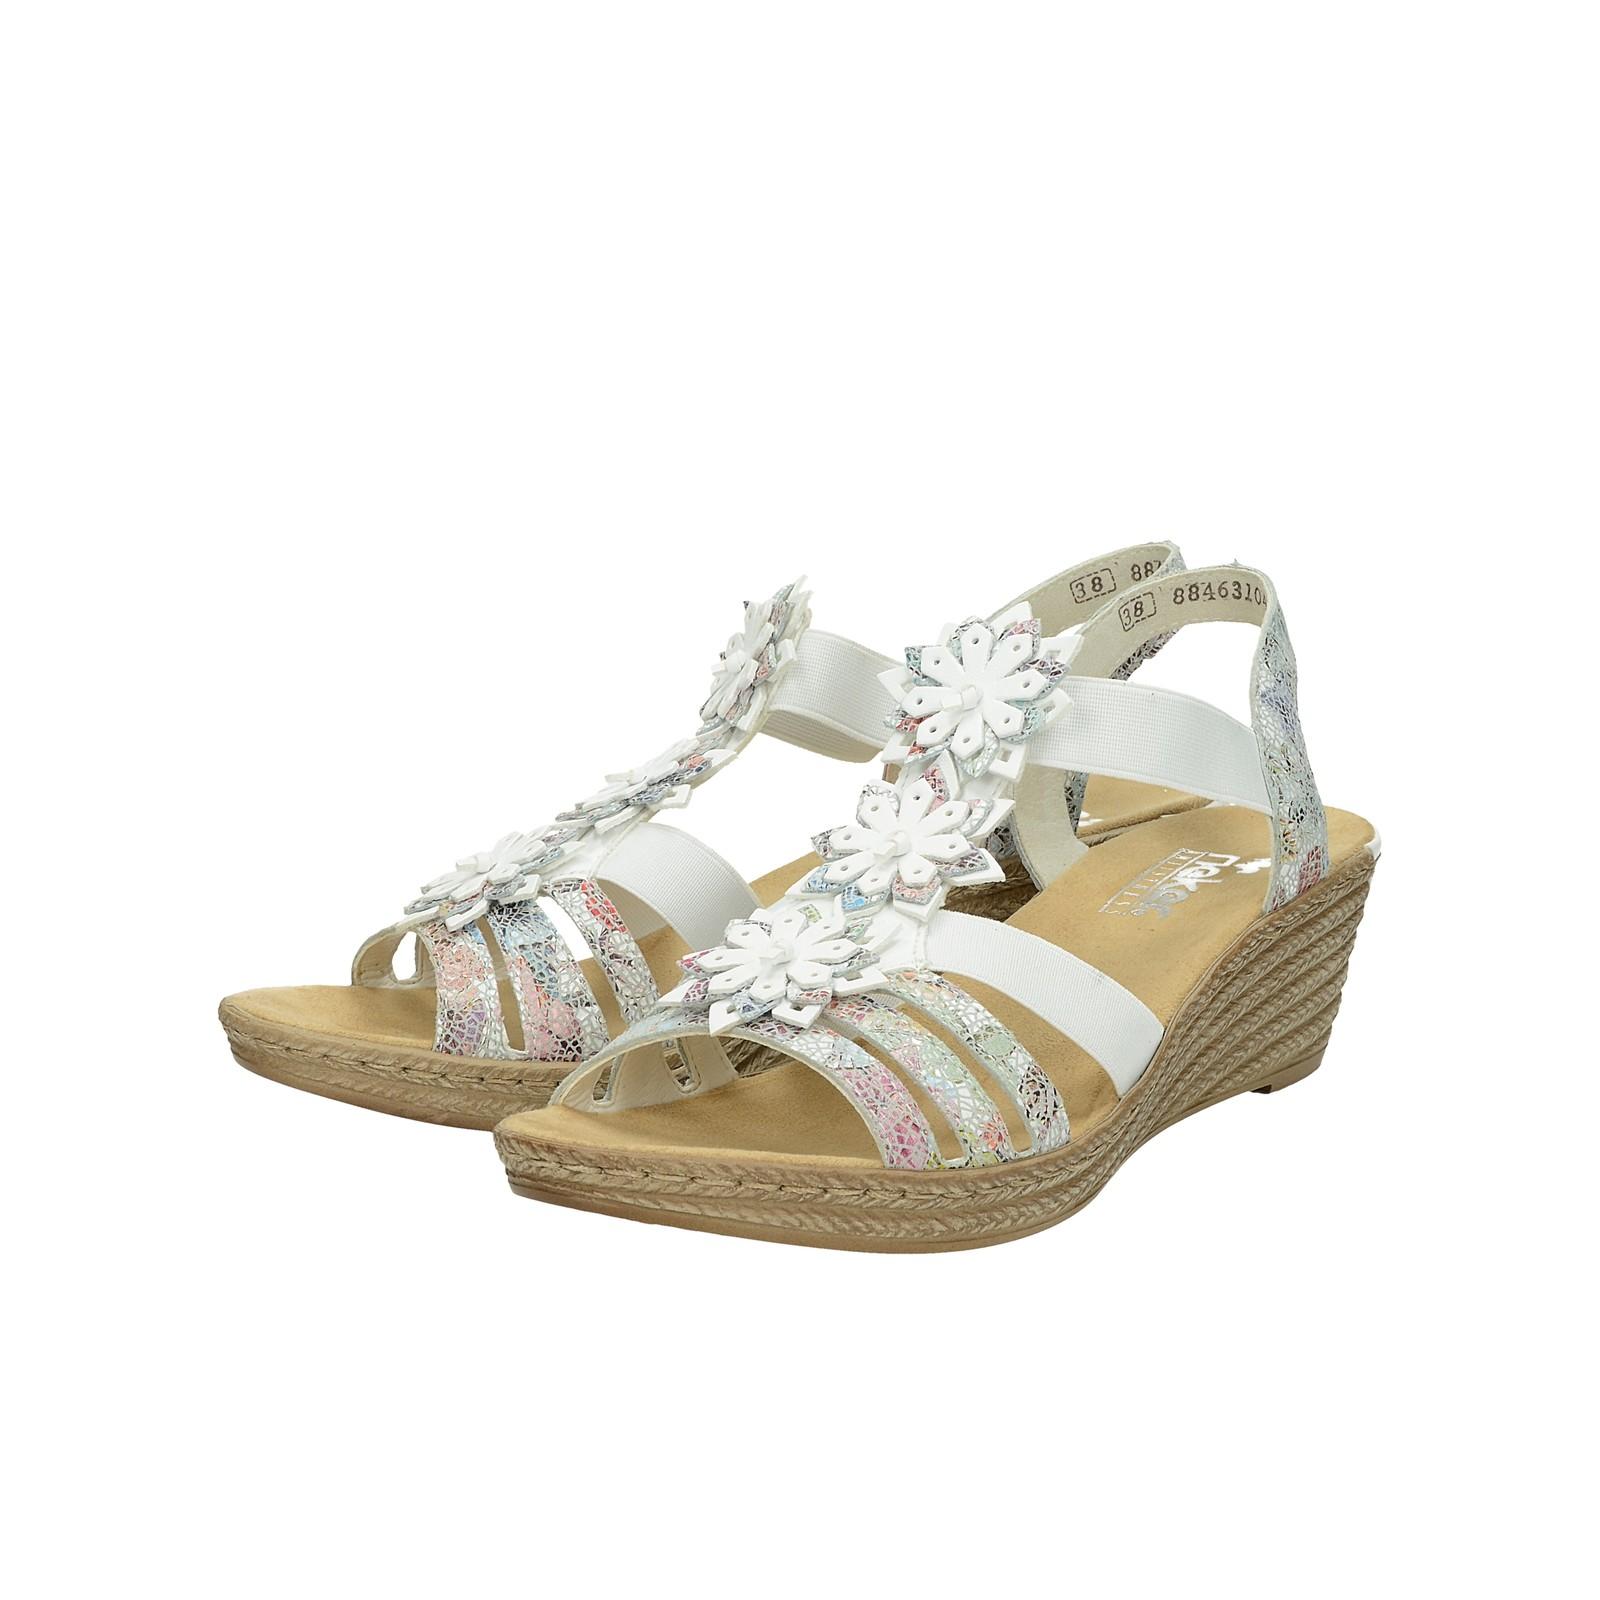 7762baa25 Rieker dámske štýlové sandále - biele | 6246191-ICEmulti www.robel.sk